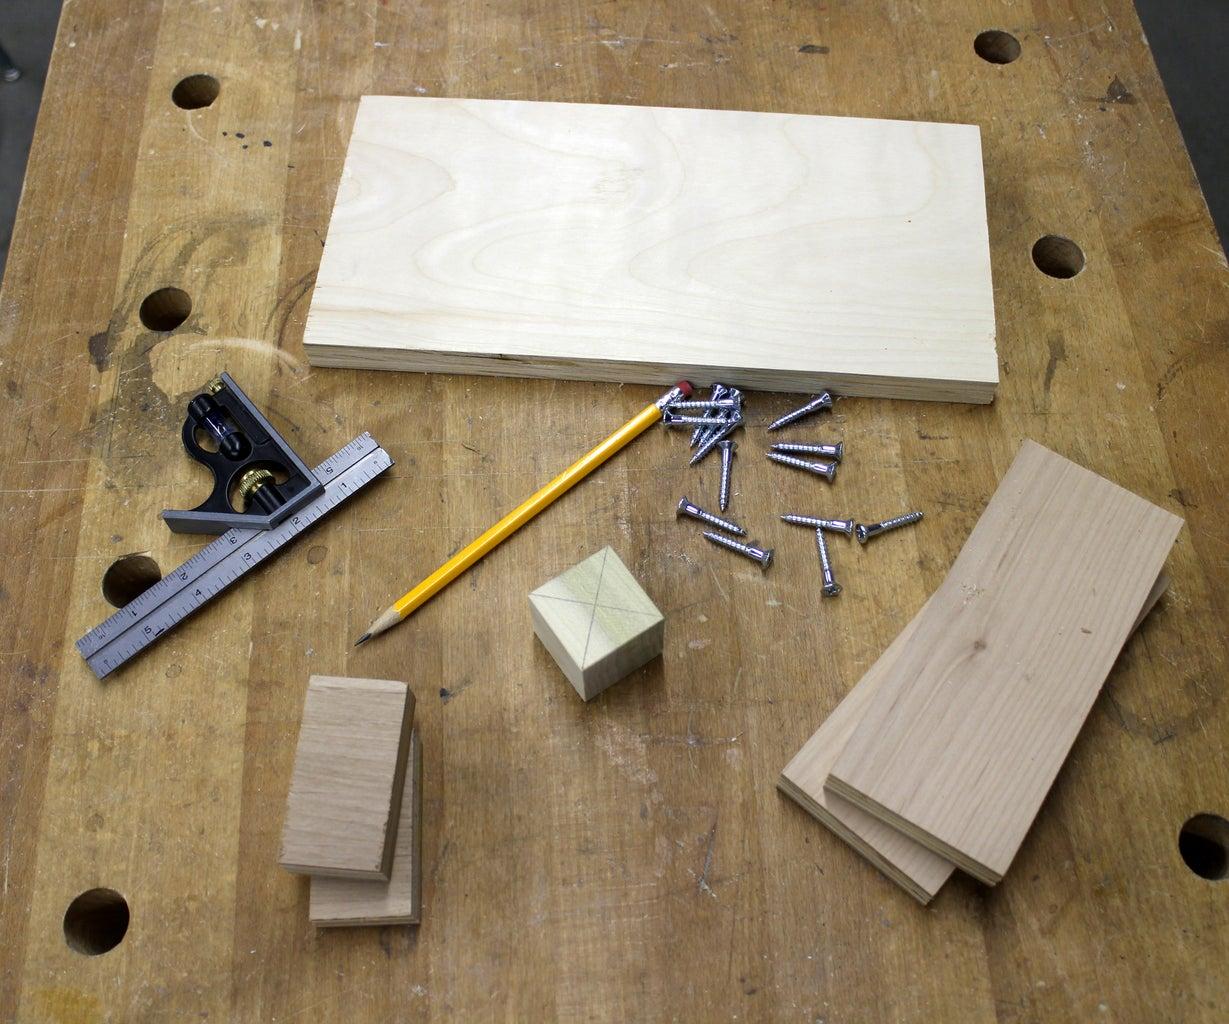 Making the Blocks